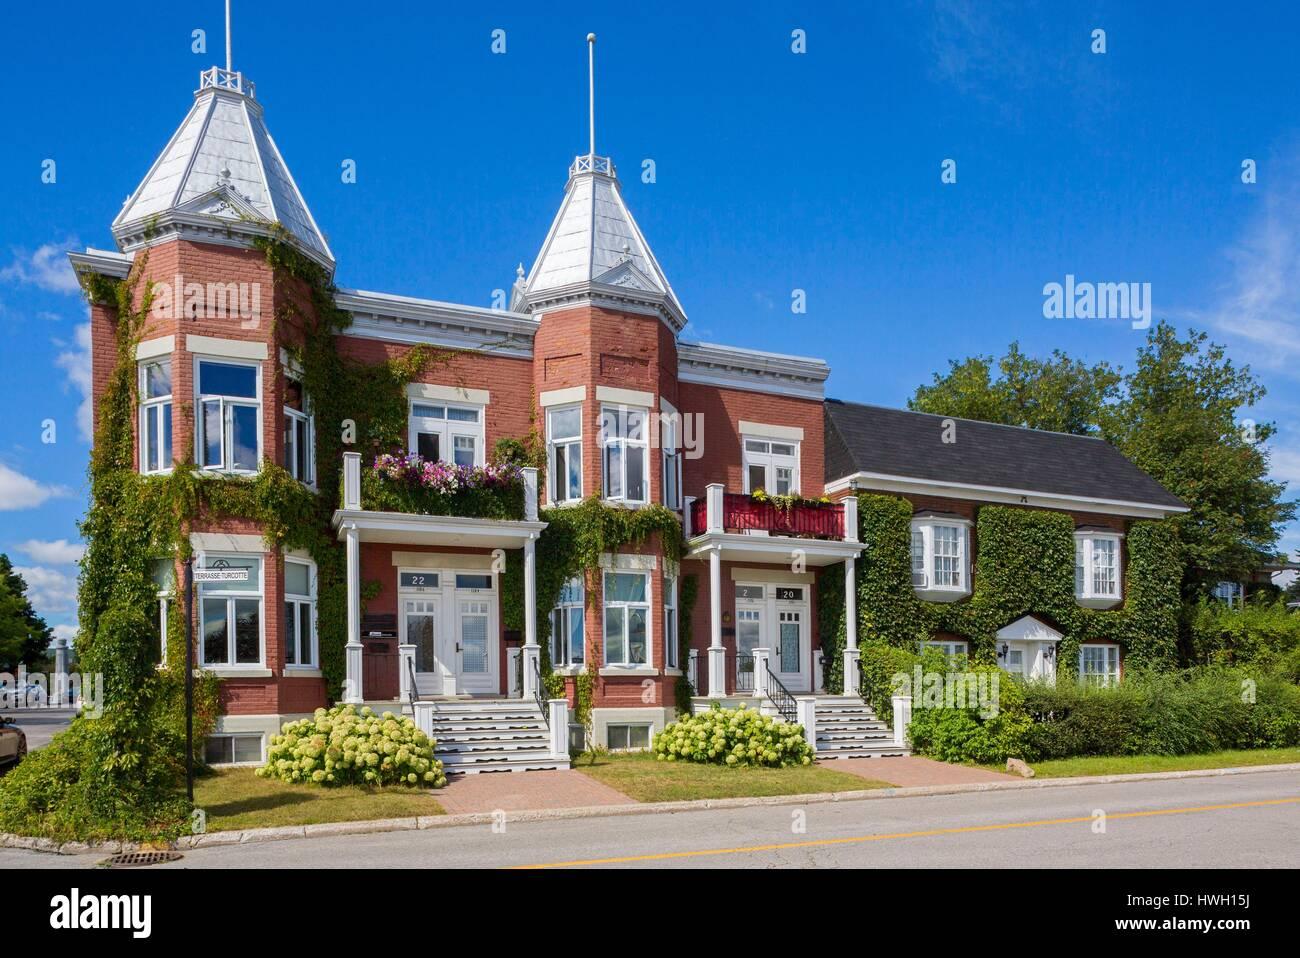 Turcotte Stock Photos & Turcotte Stock Images - Alamy